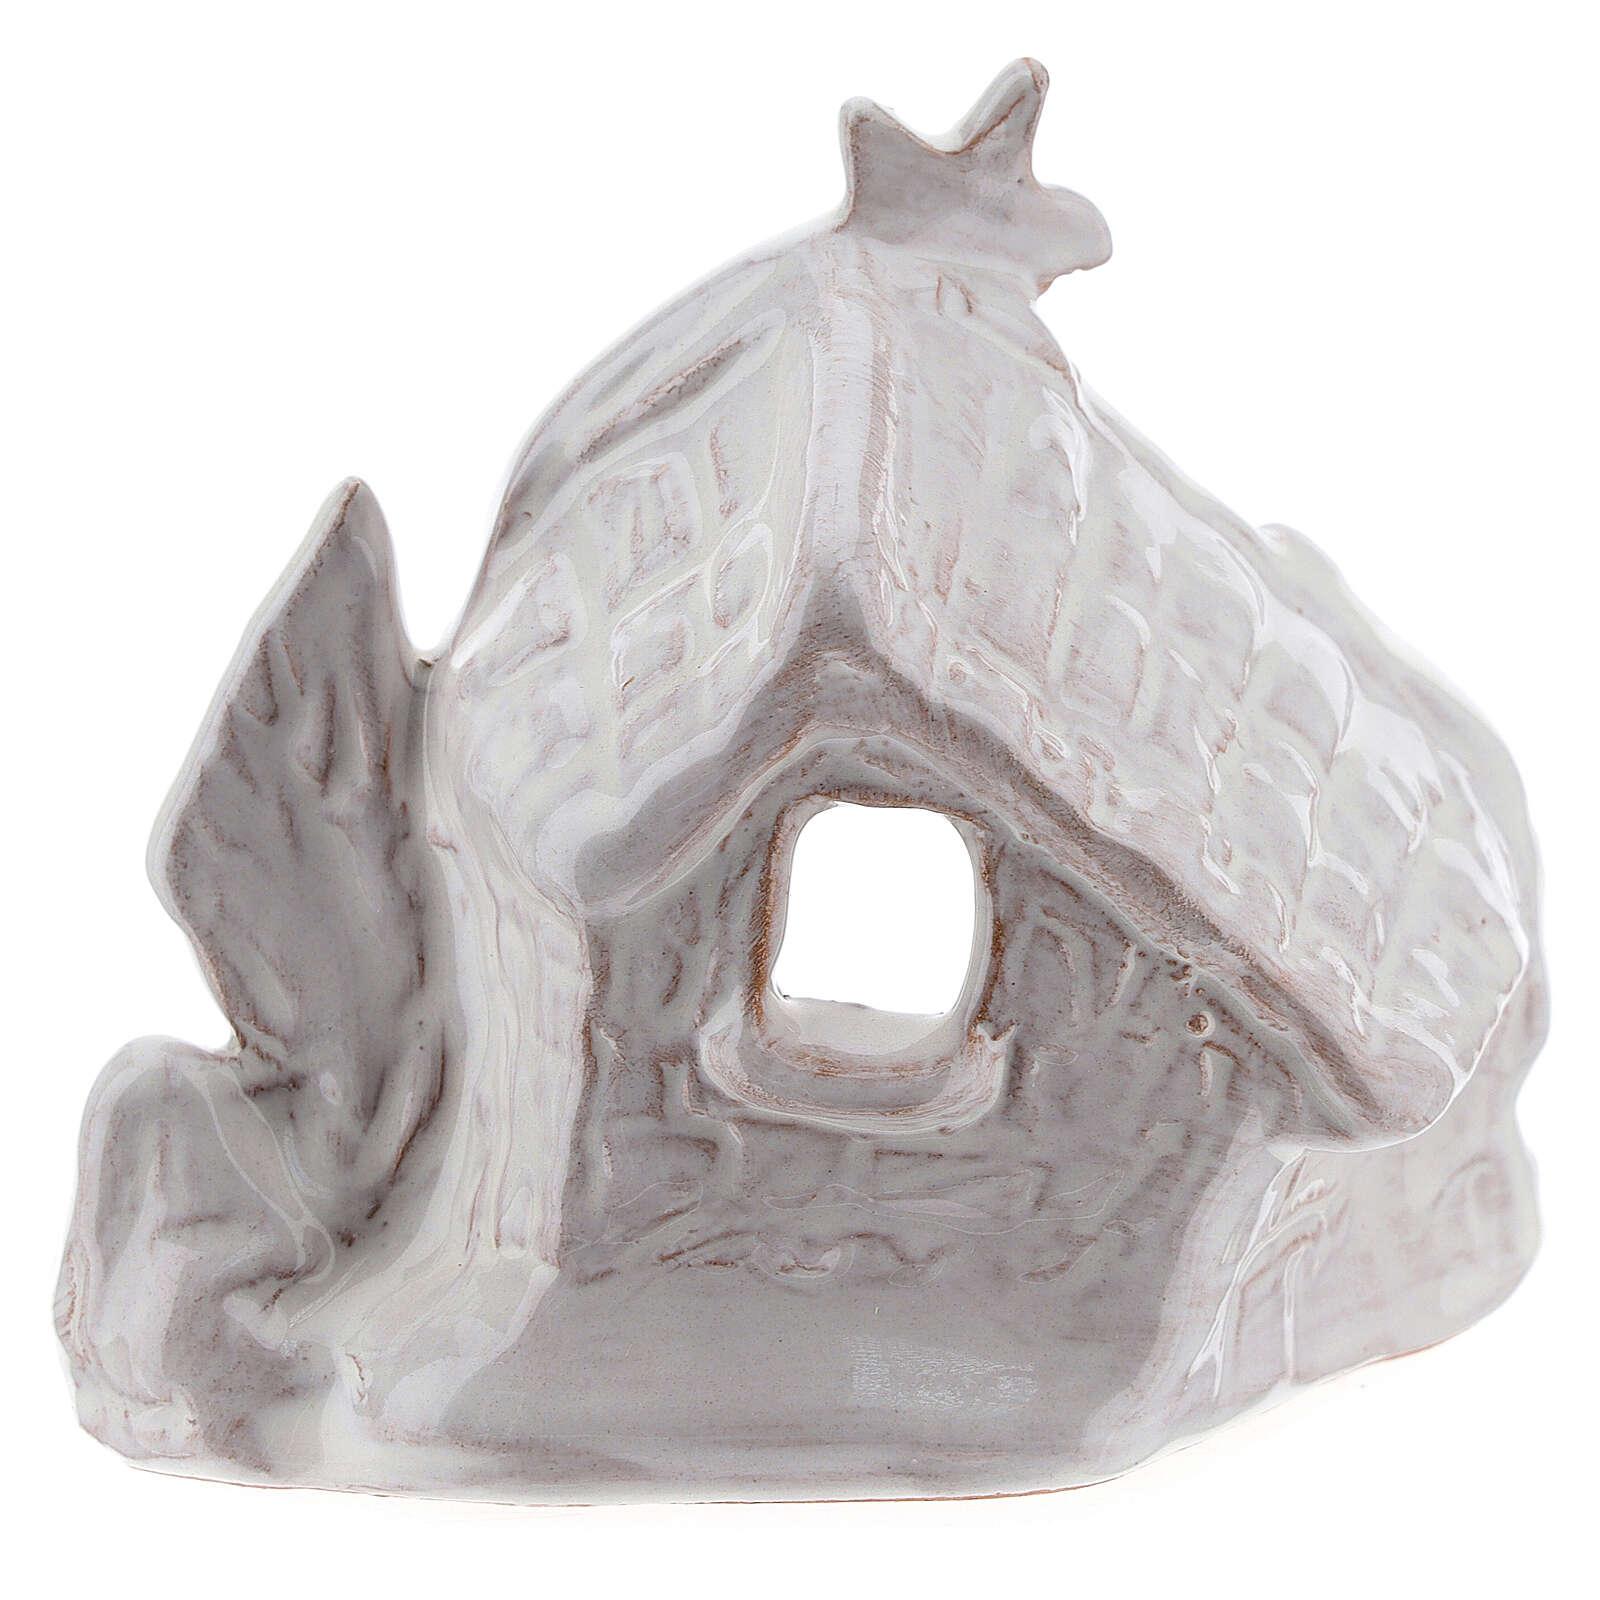 Nativity hut with comet in white Deruta terracotta 8 cm 4